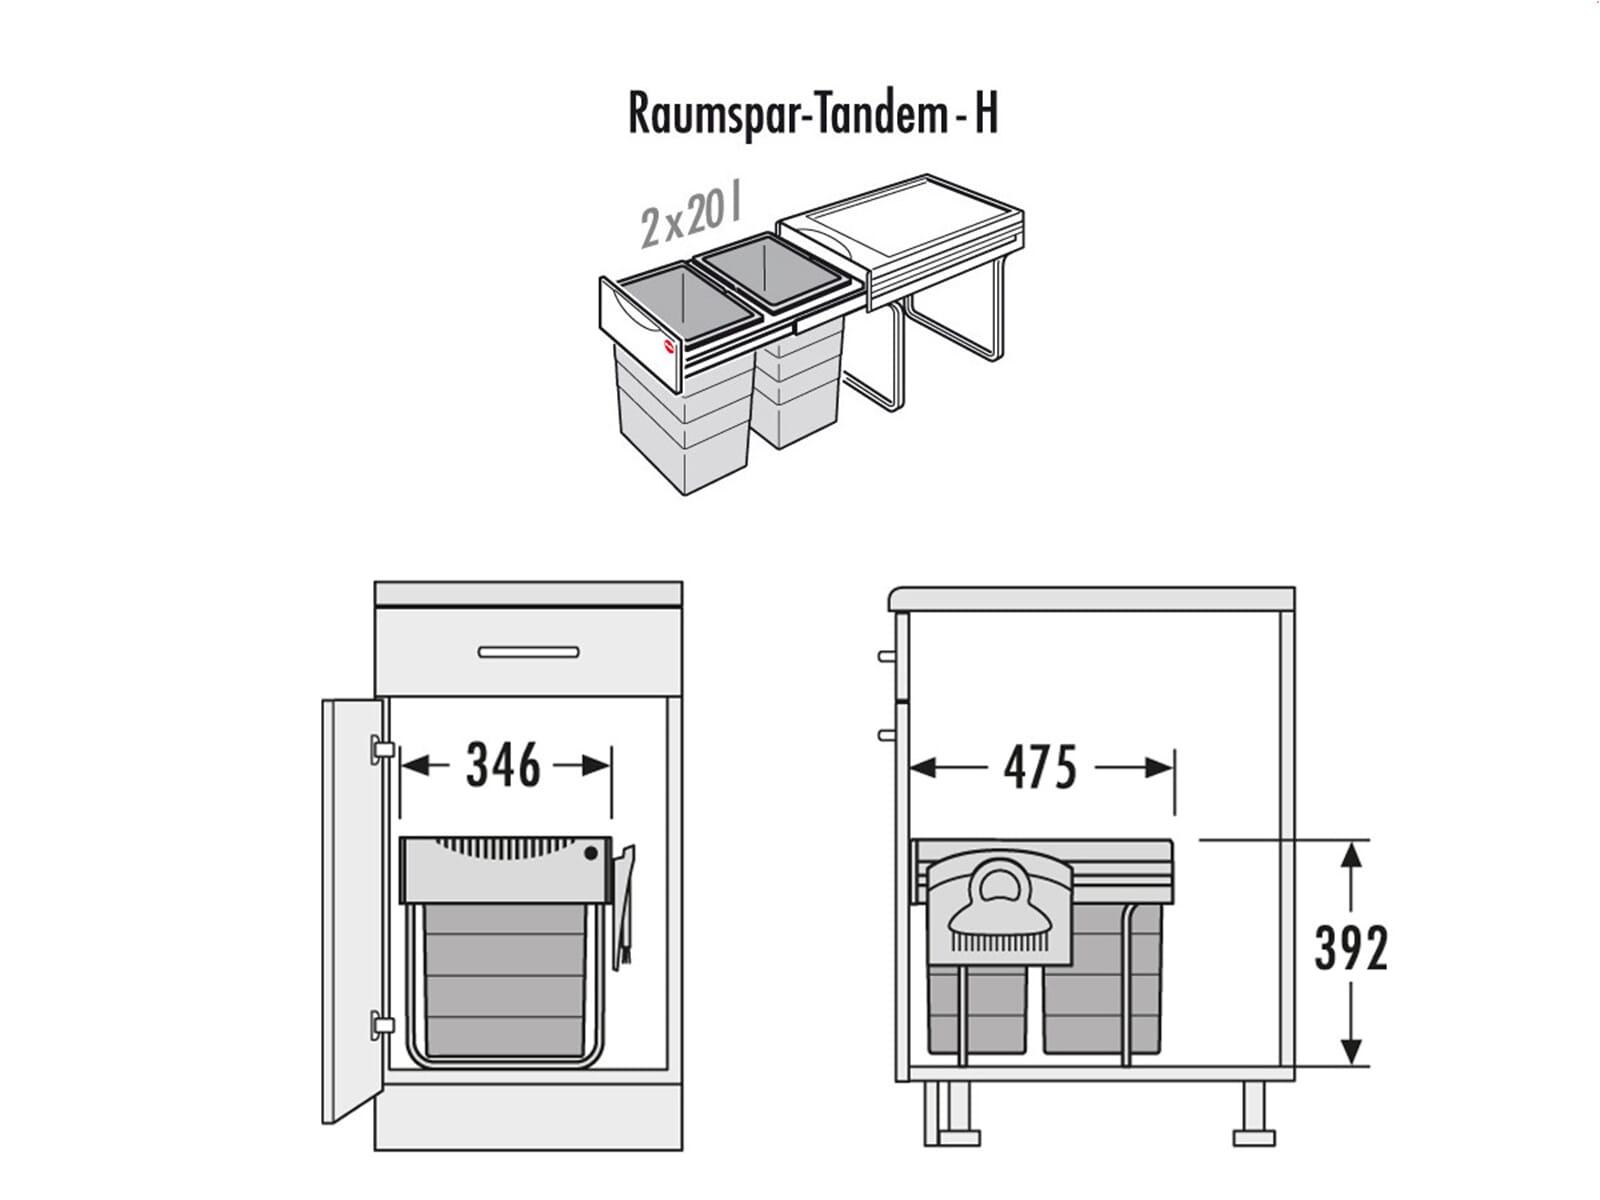 hailo raumspar tandem comfort 3641 221 einbau abfallsammler. Black Bedroom Furniture Sets. Home Design Ideas